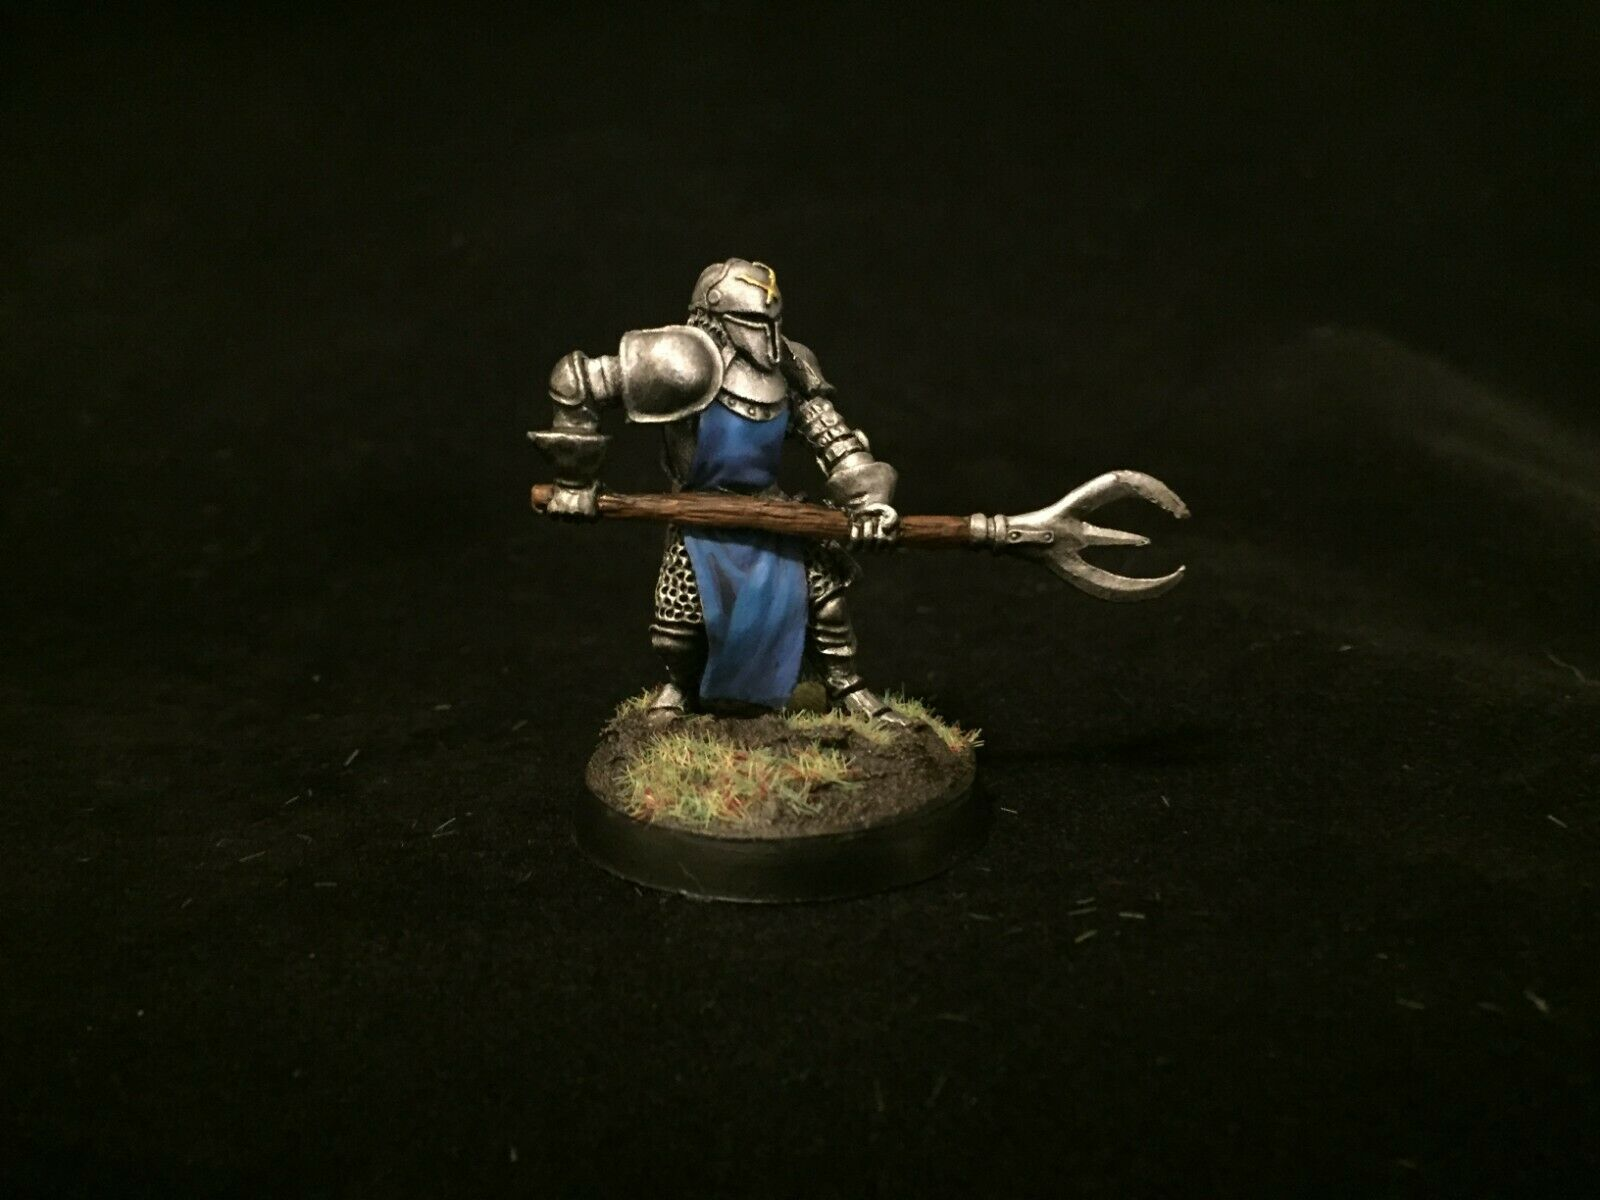 Painted Reaper Miniature Knight Metal D&D Pathfinder Fantasy RPG Gaming